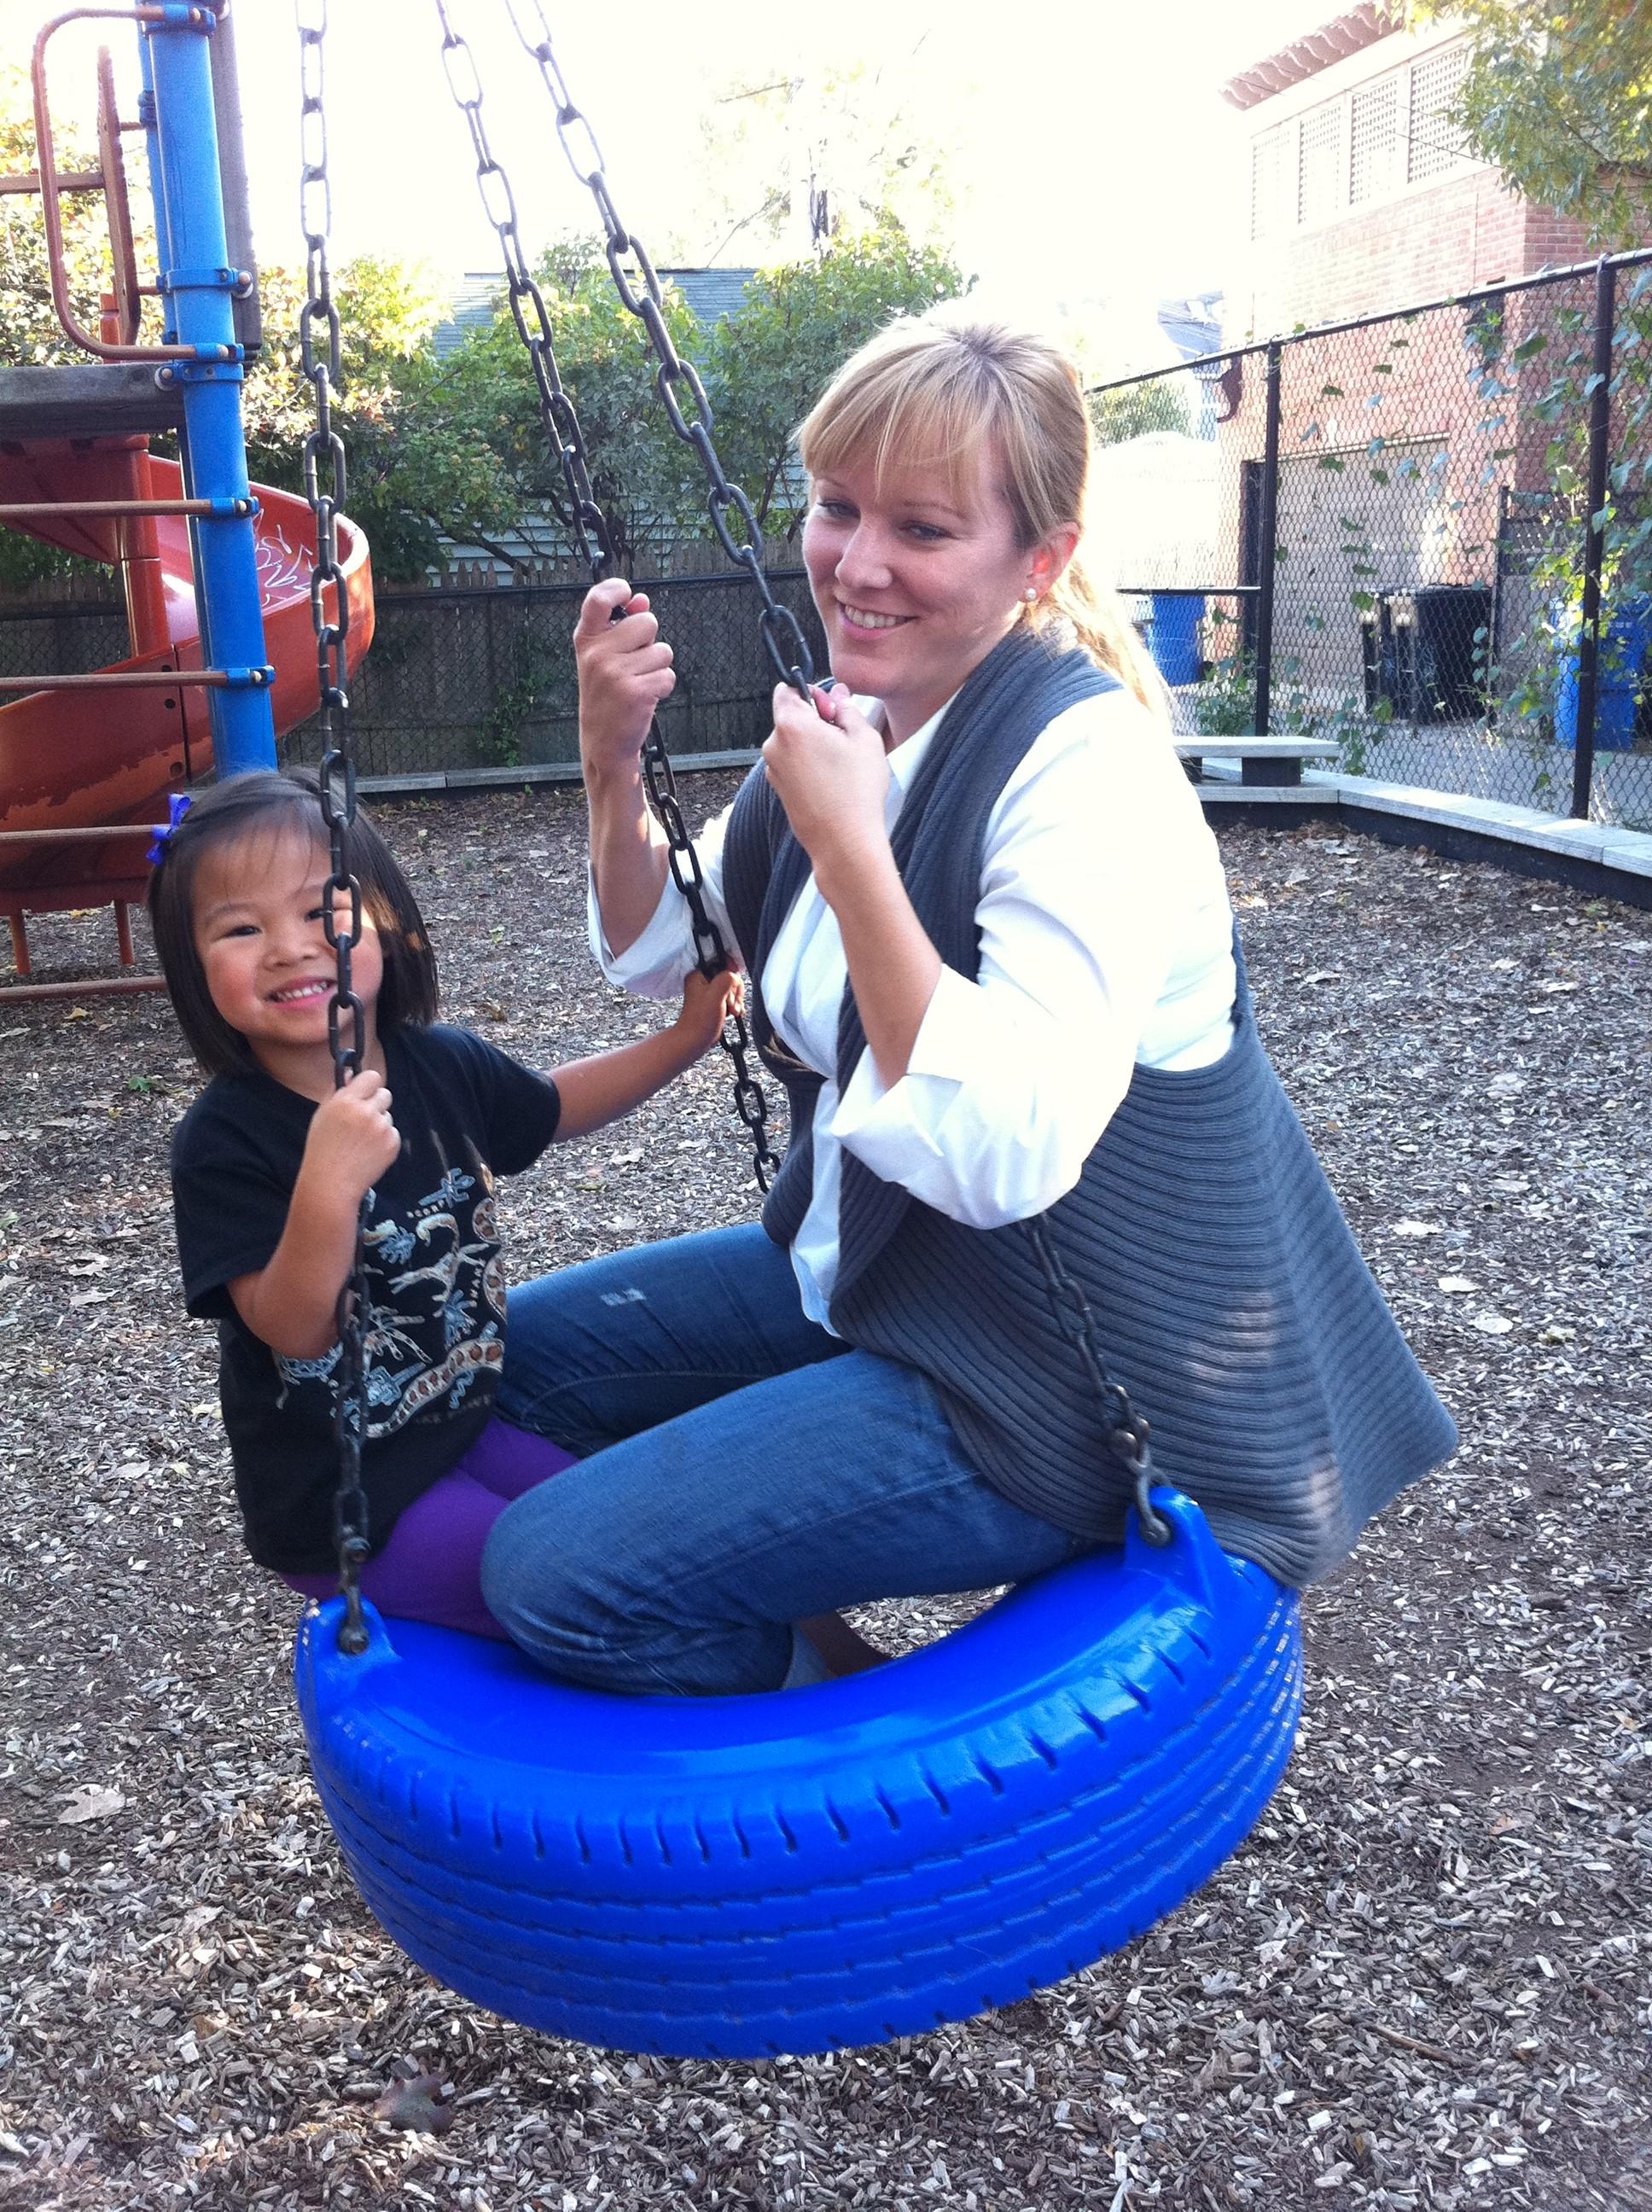 Swingin' with Auntie Lisa